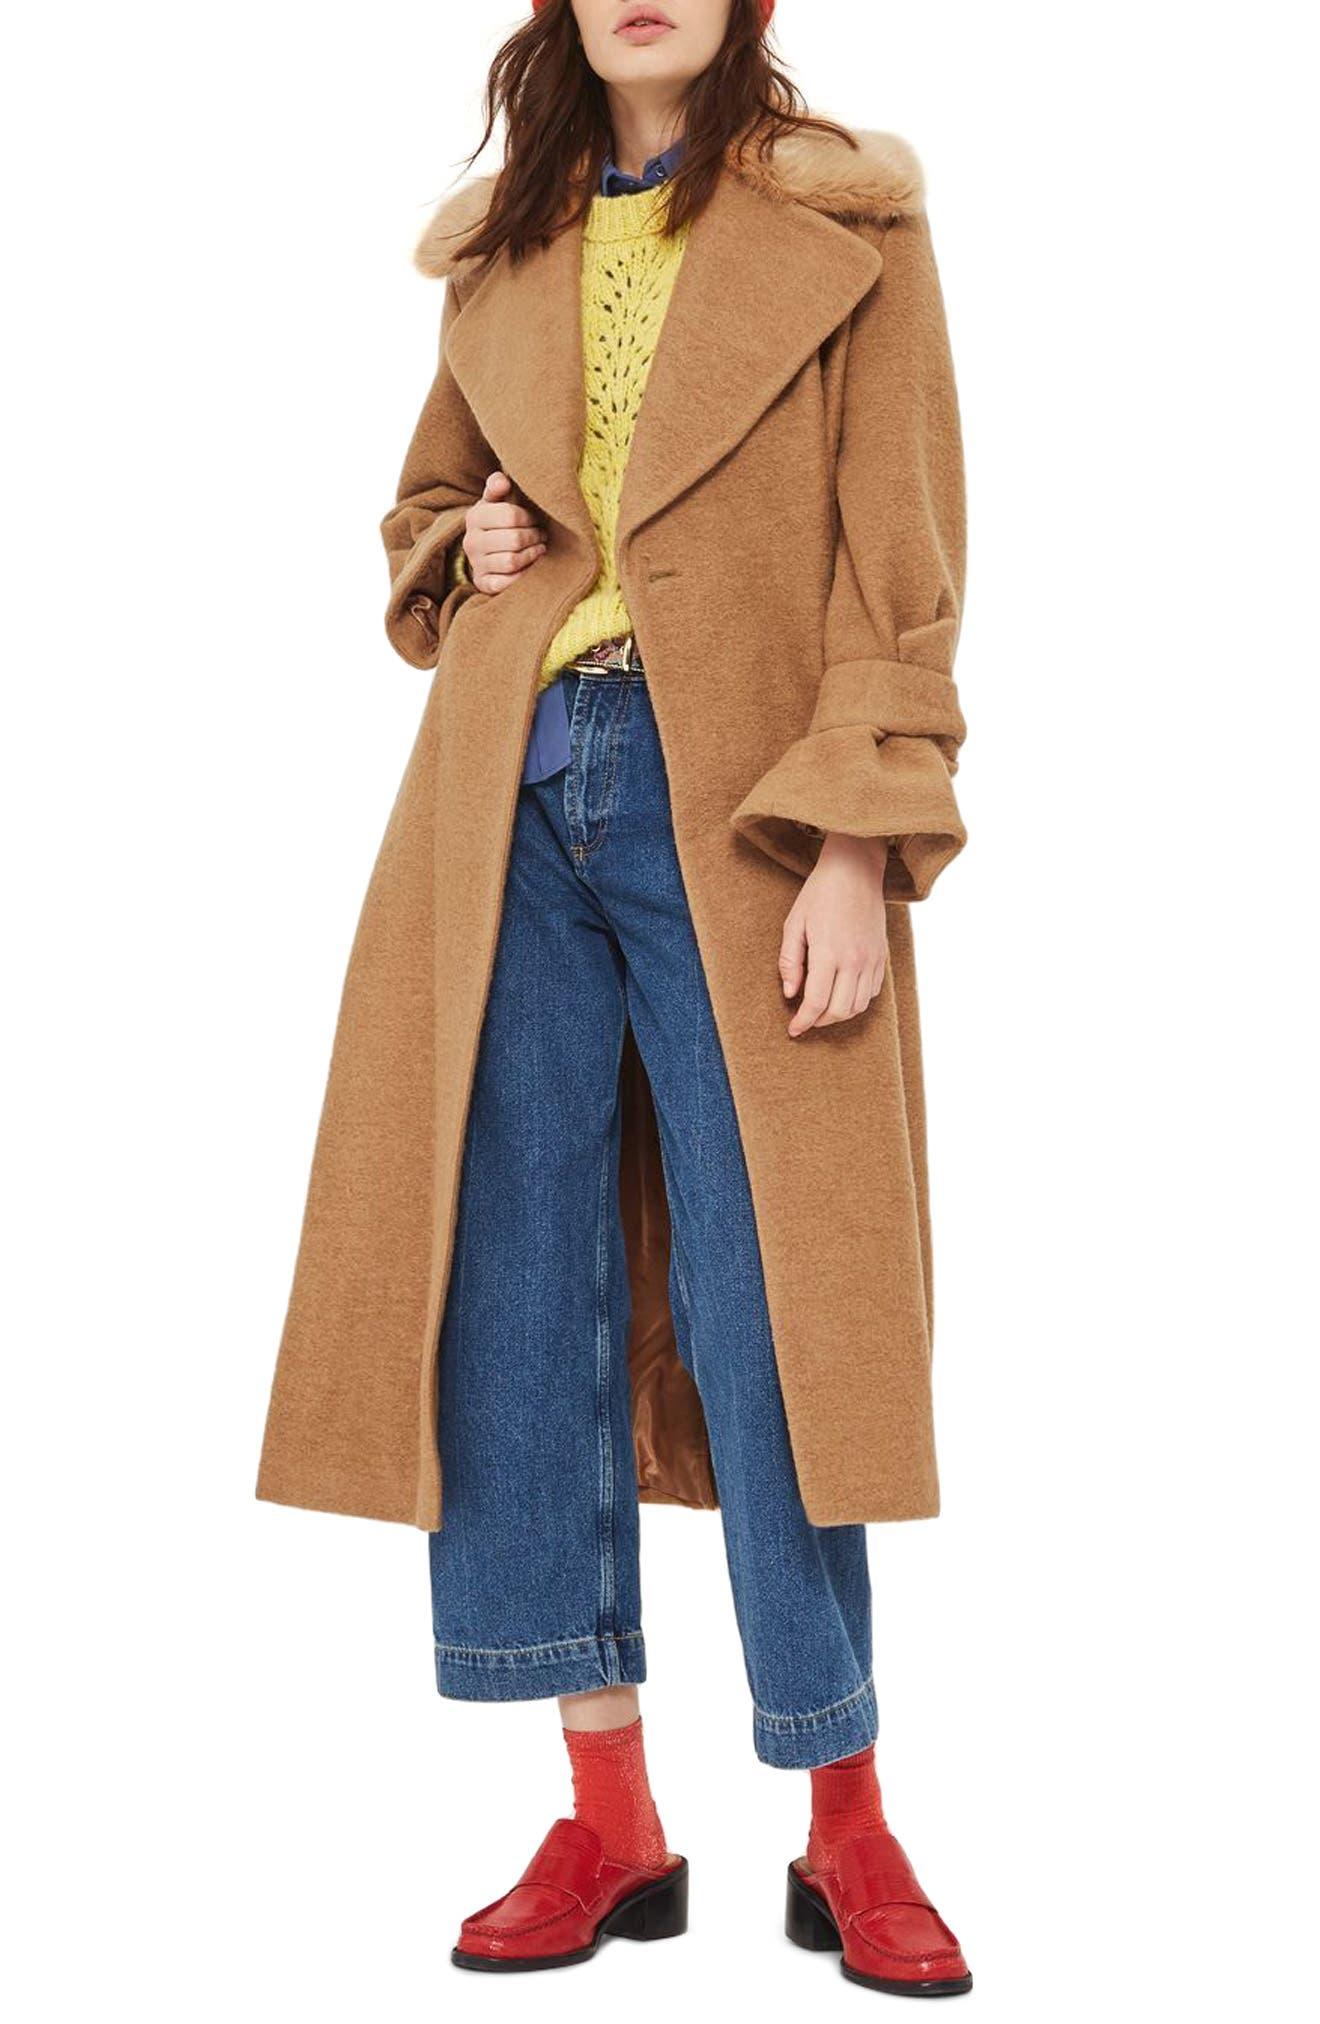 Topshop Faux Fur Collar Belted Wool Blend Coat